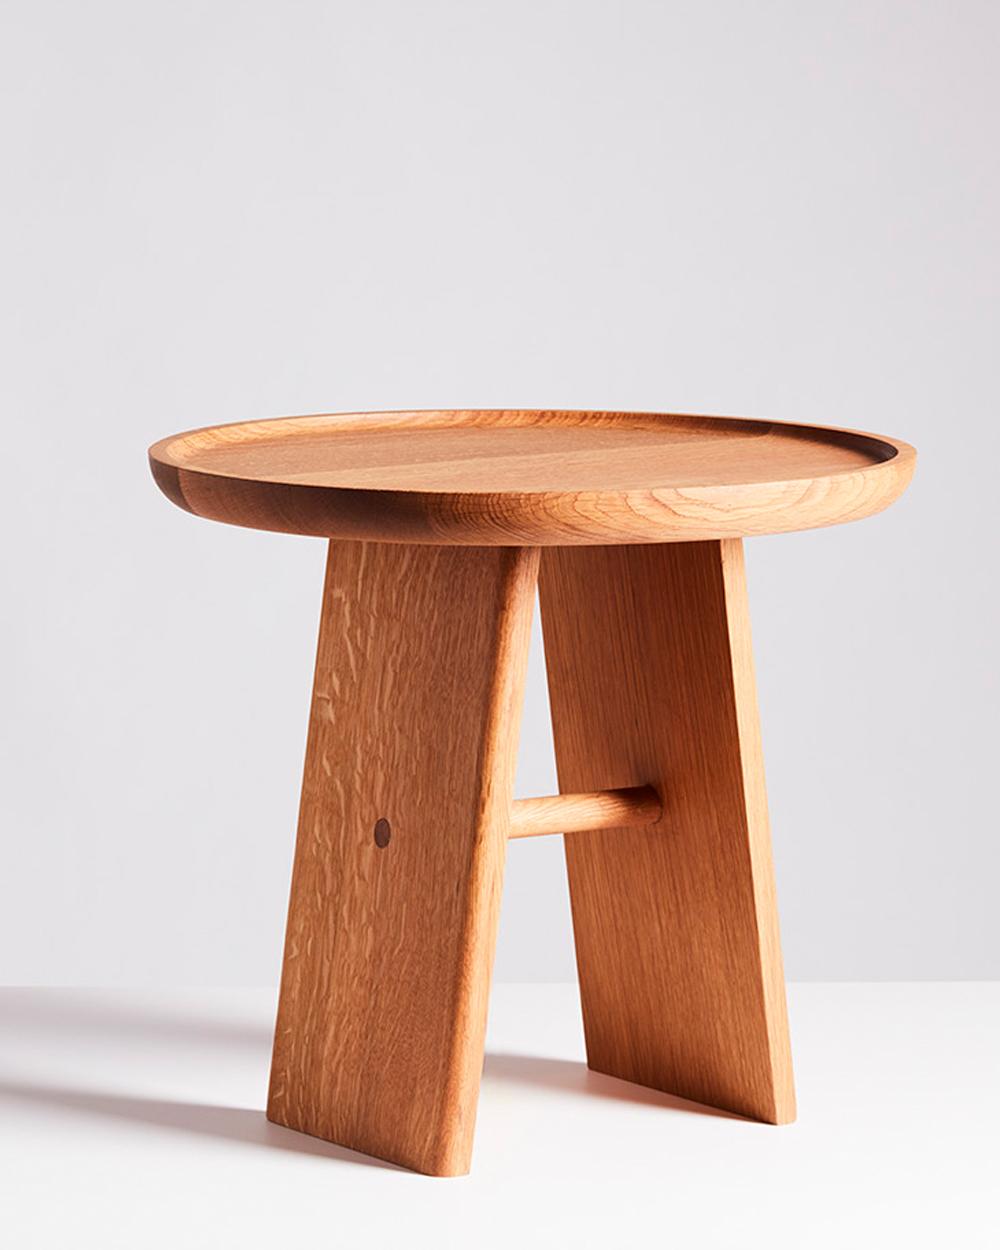 Slant table_primew_03.jpg